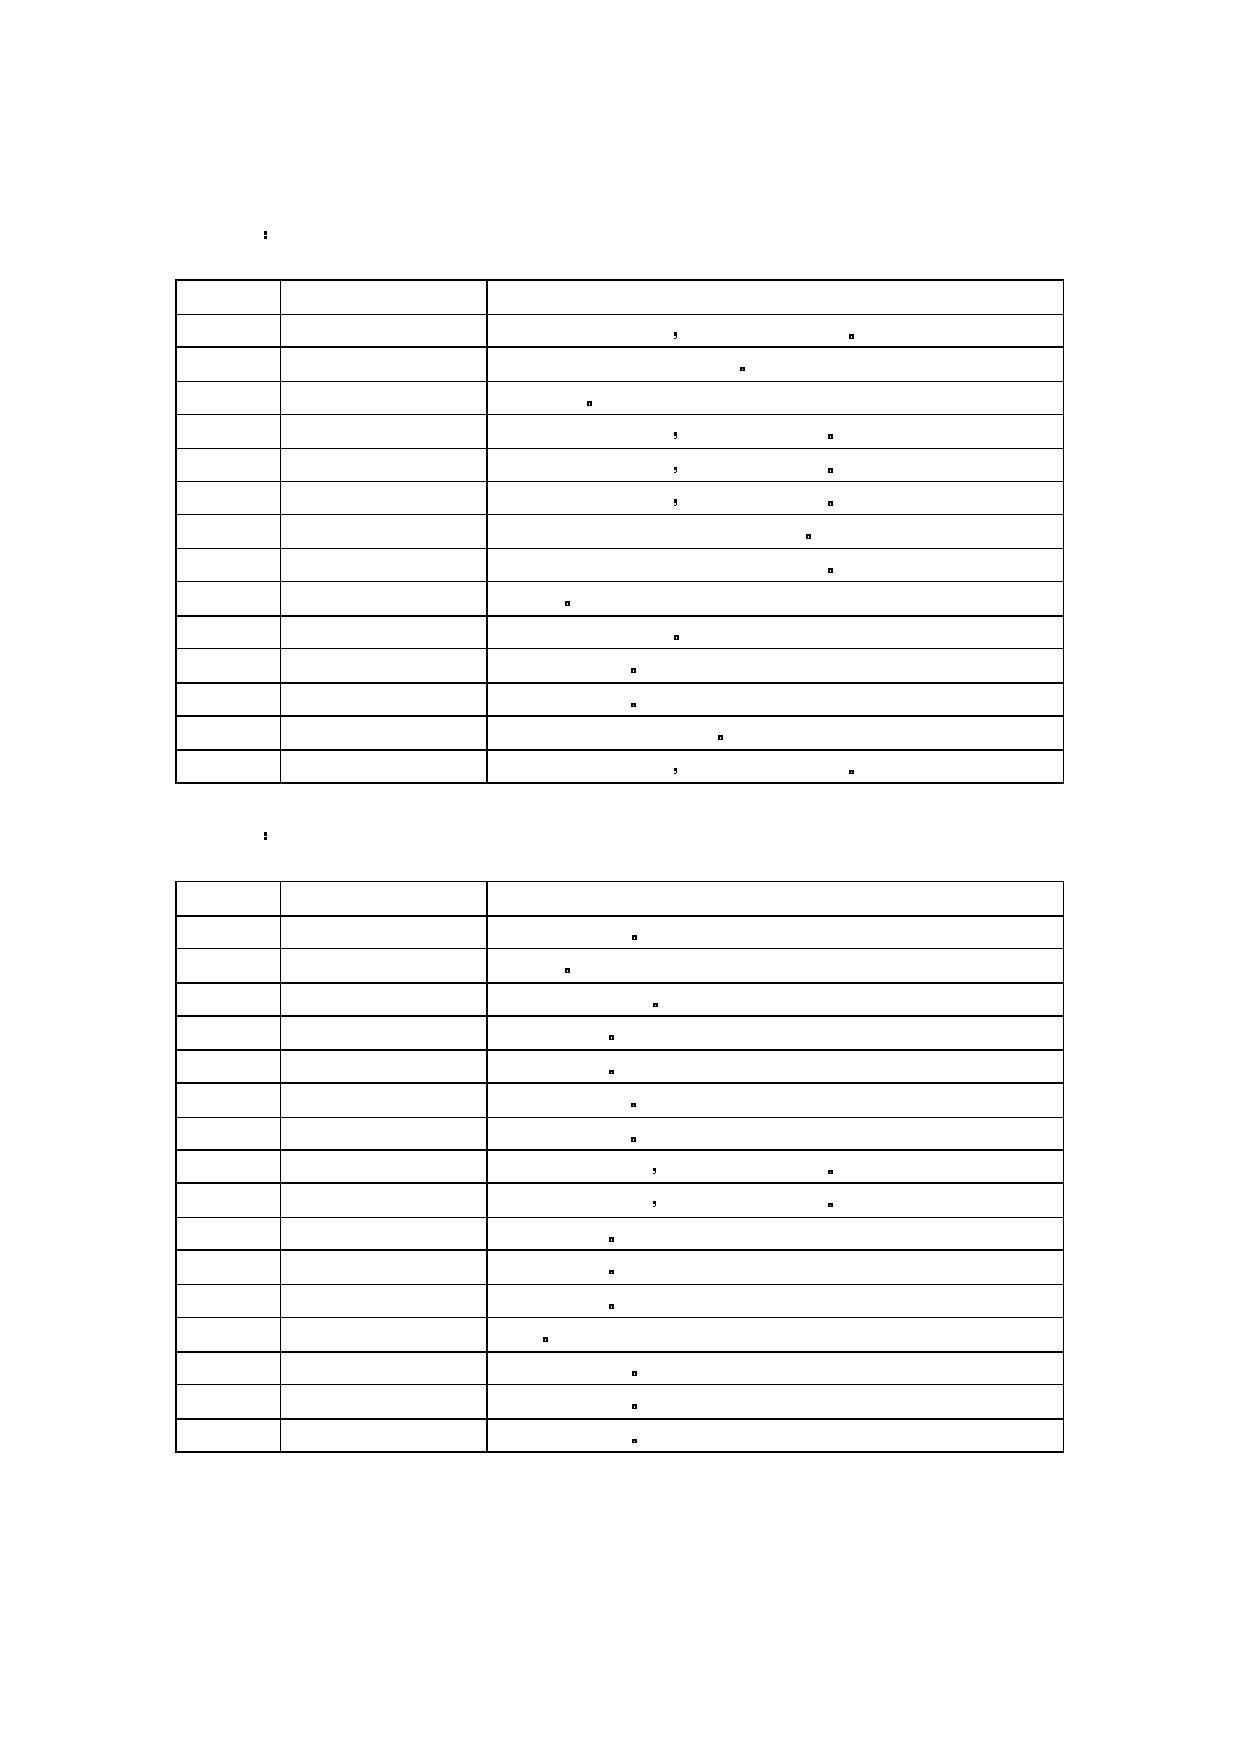 SM6136 data sheet